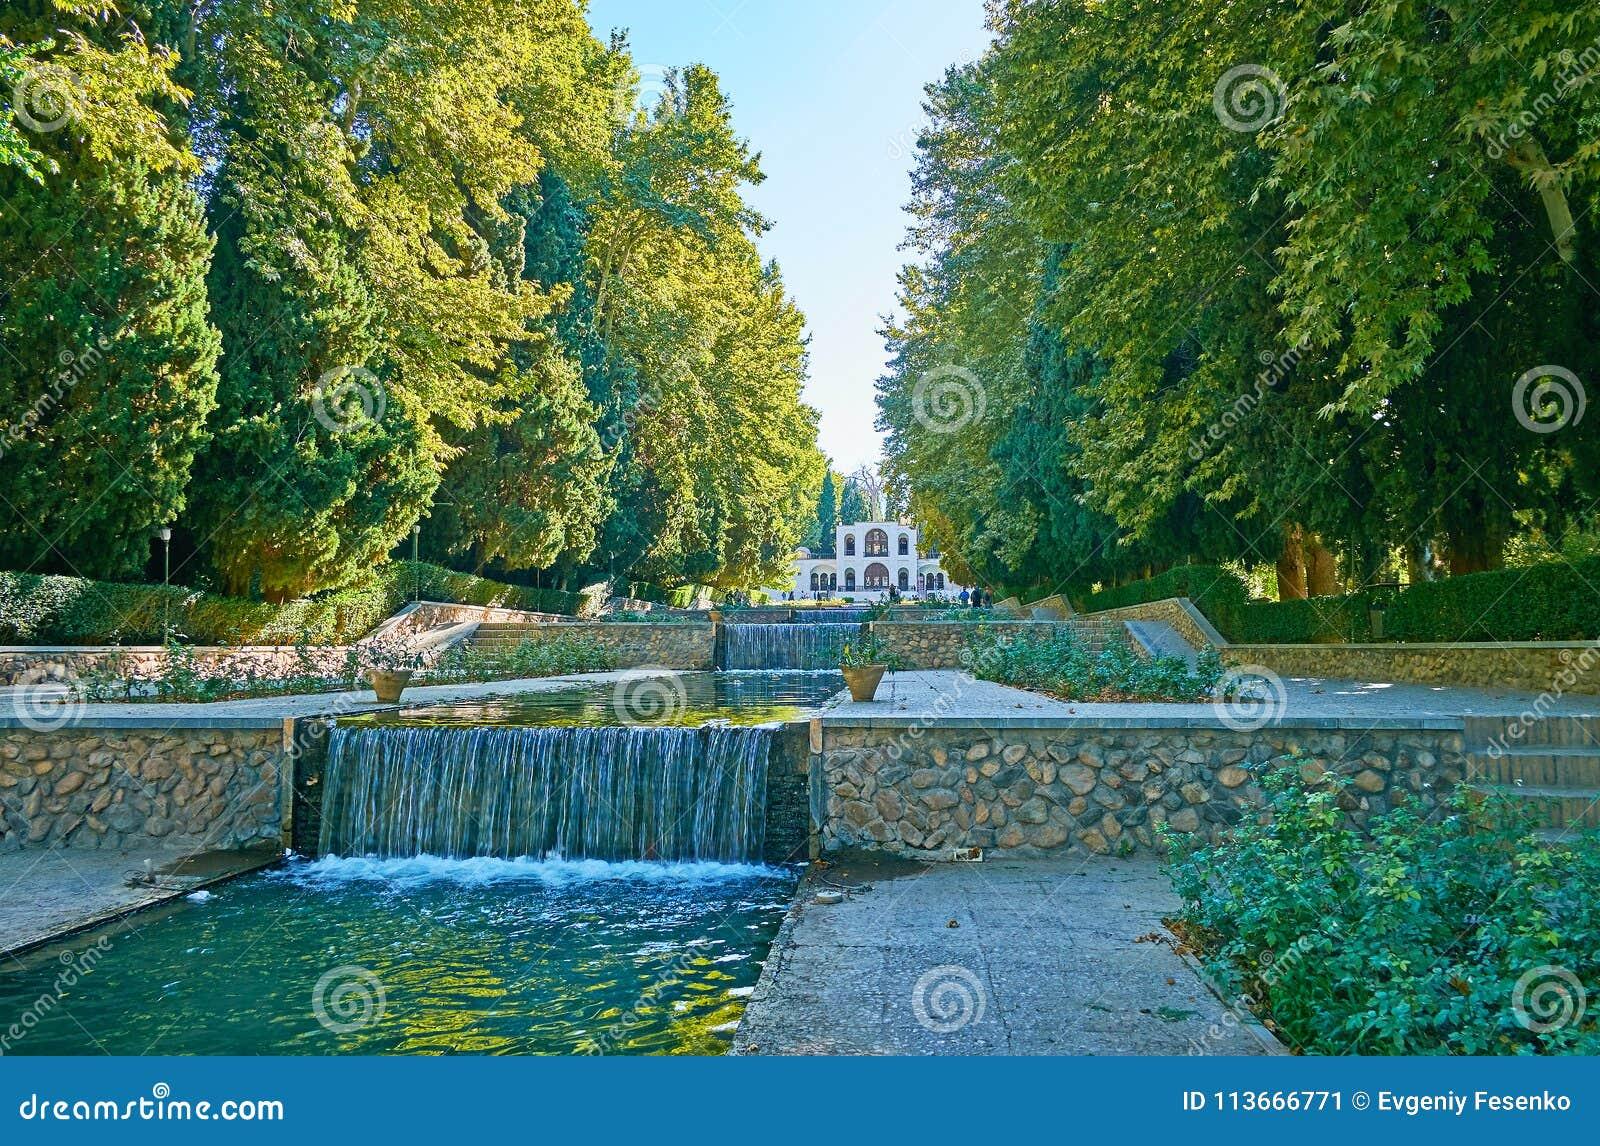 Giardino A Terrazze.Giardino A Terrazze Di Shazdeh Mahan Iran Immagine Stock